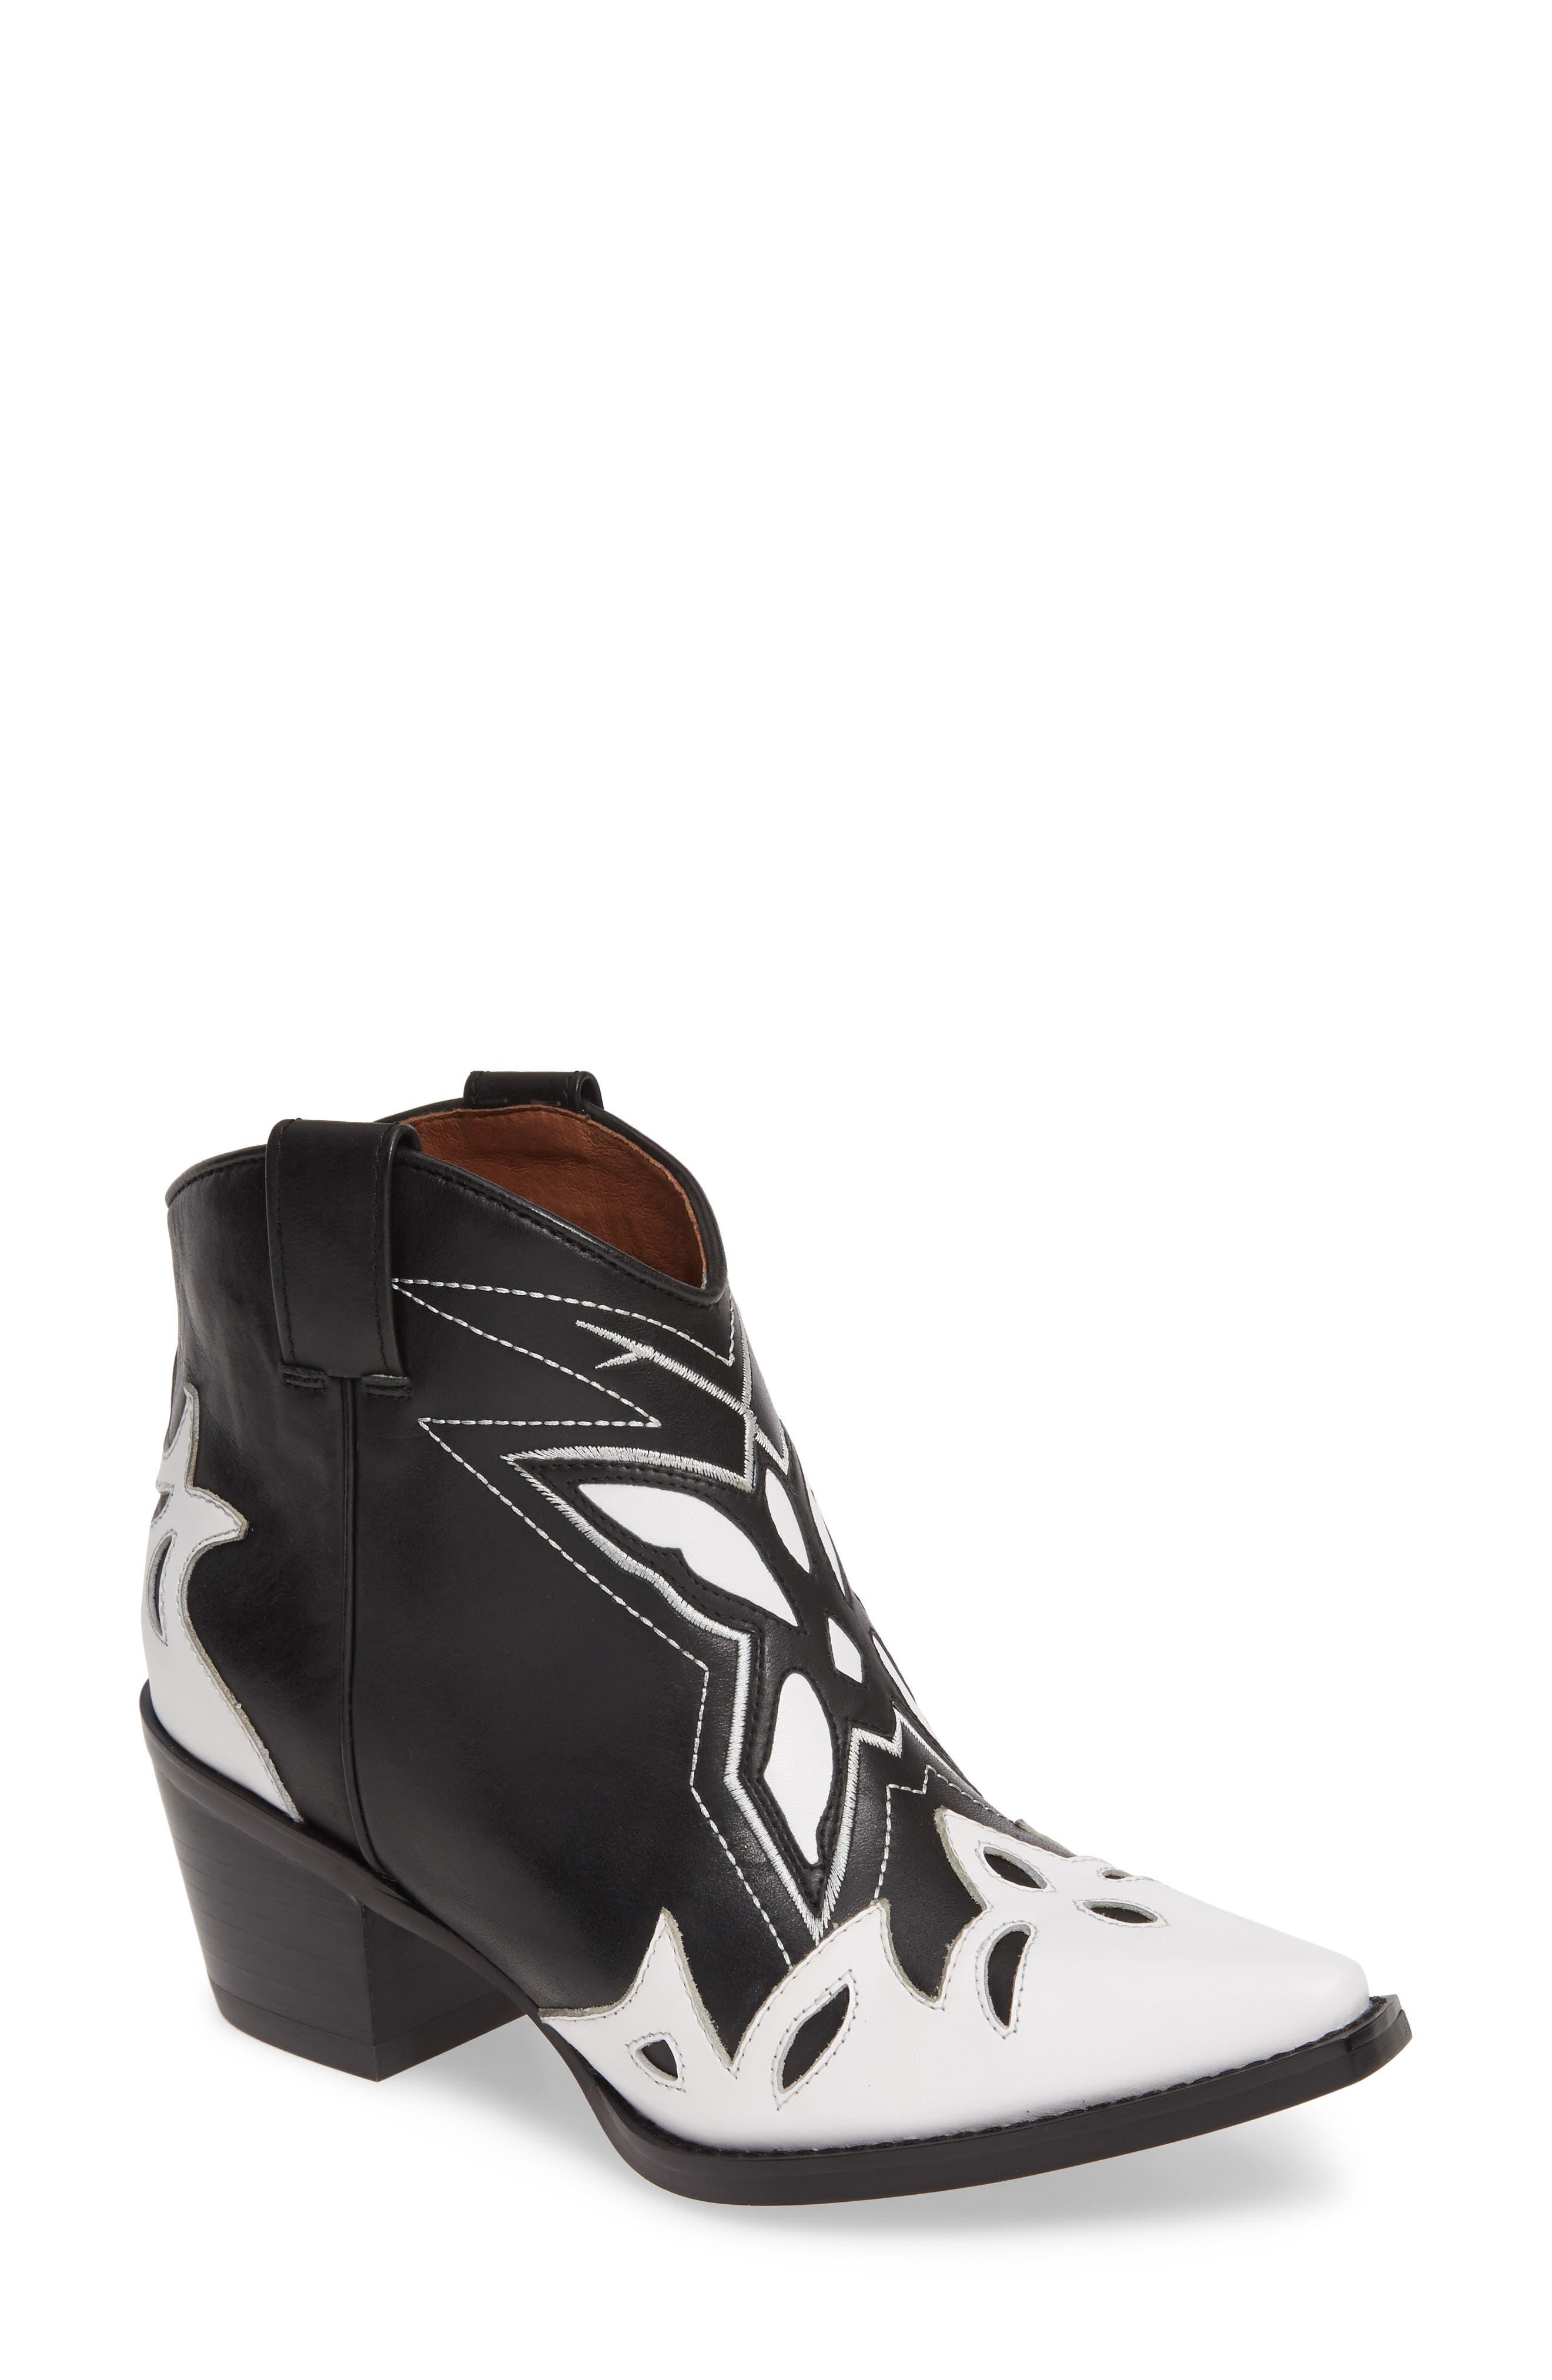 Jeffrey Campbell Tooney Western Boot- Black